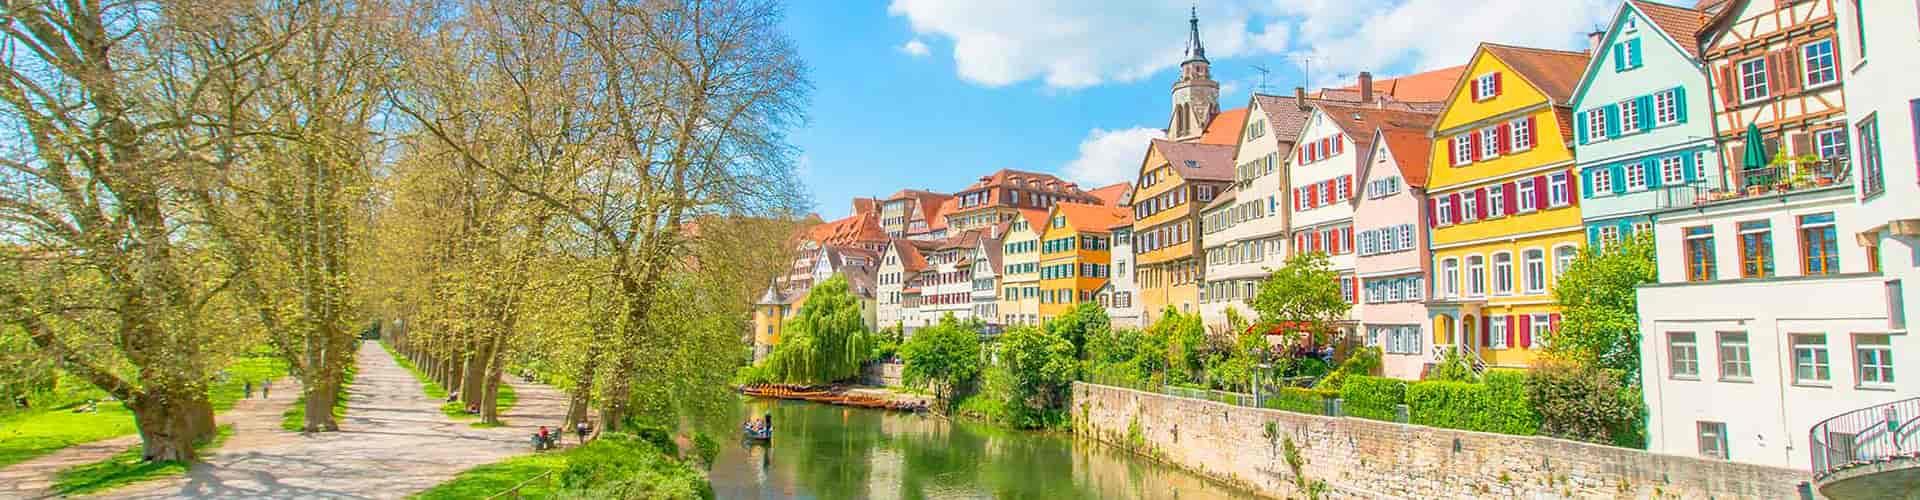 Free Tour Sttutgart - Turismo de Alemania